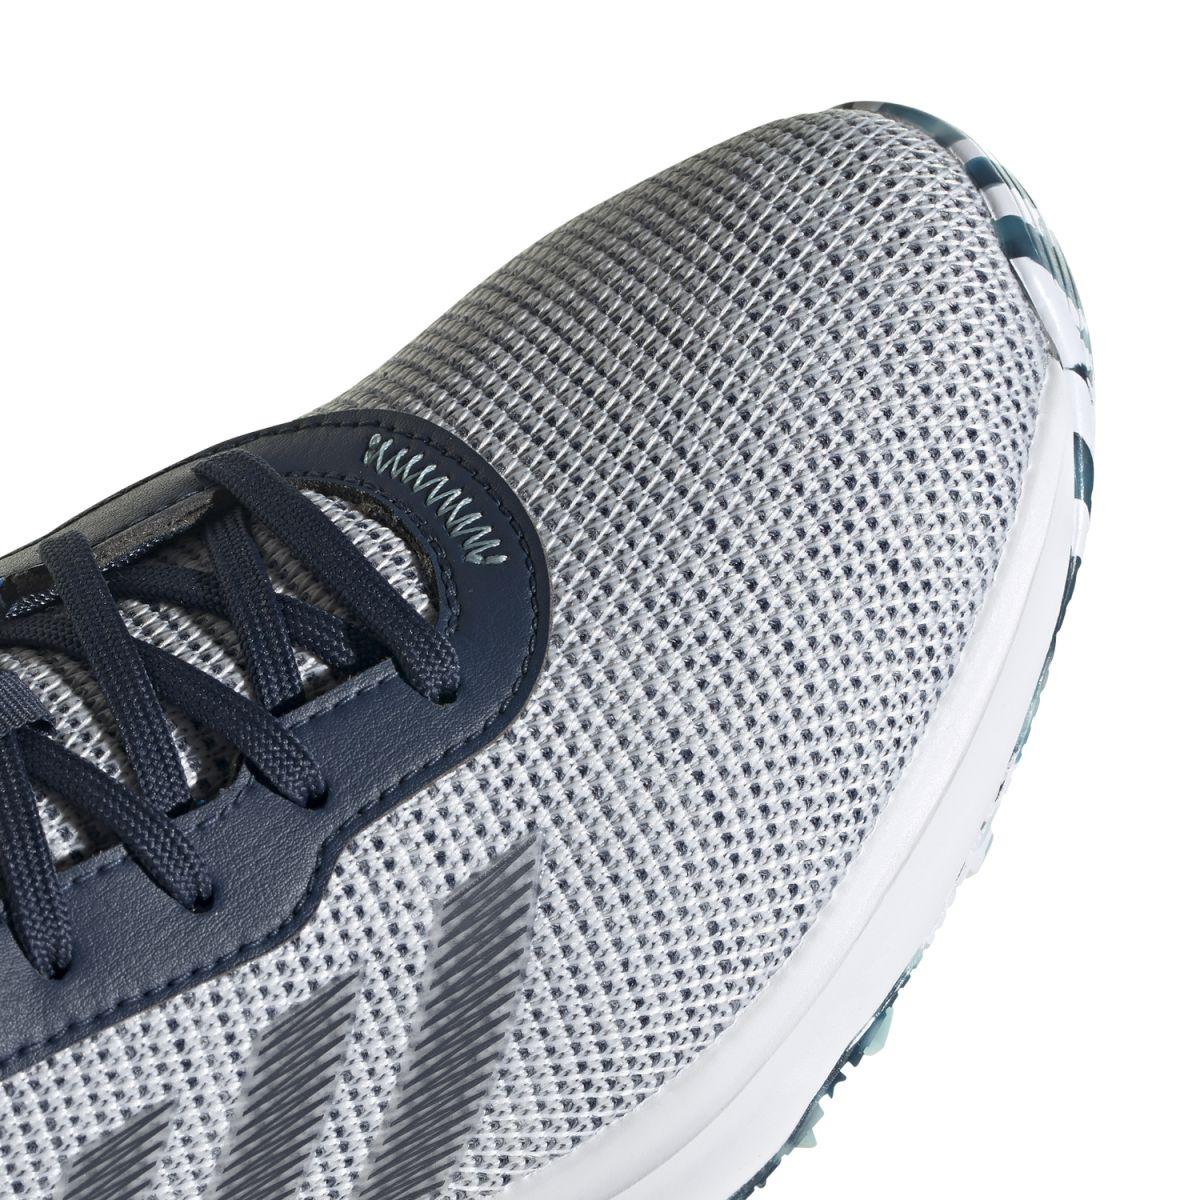 adidas w s2g sl navy grey 36